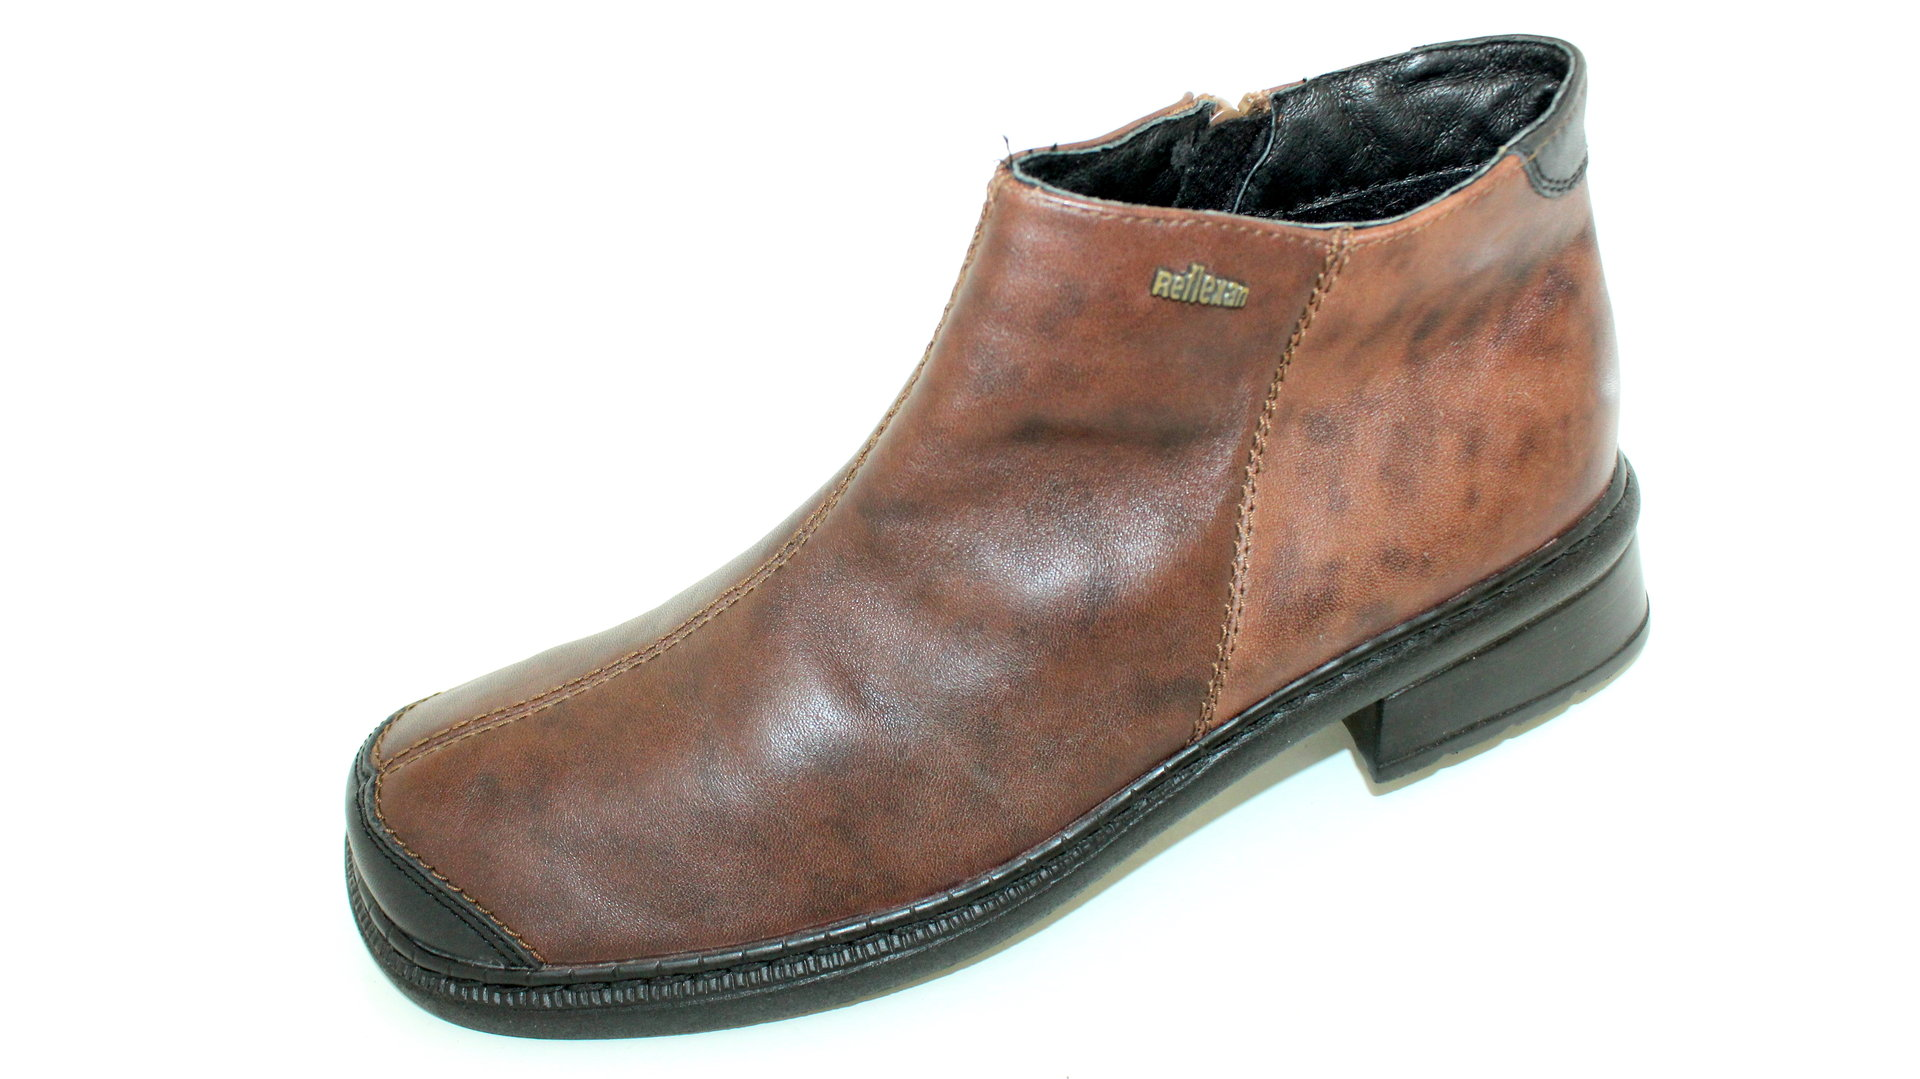 info for 45fa4 3d8be REFLEXAN Stiefeletten Boots